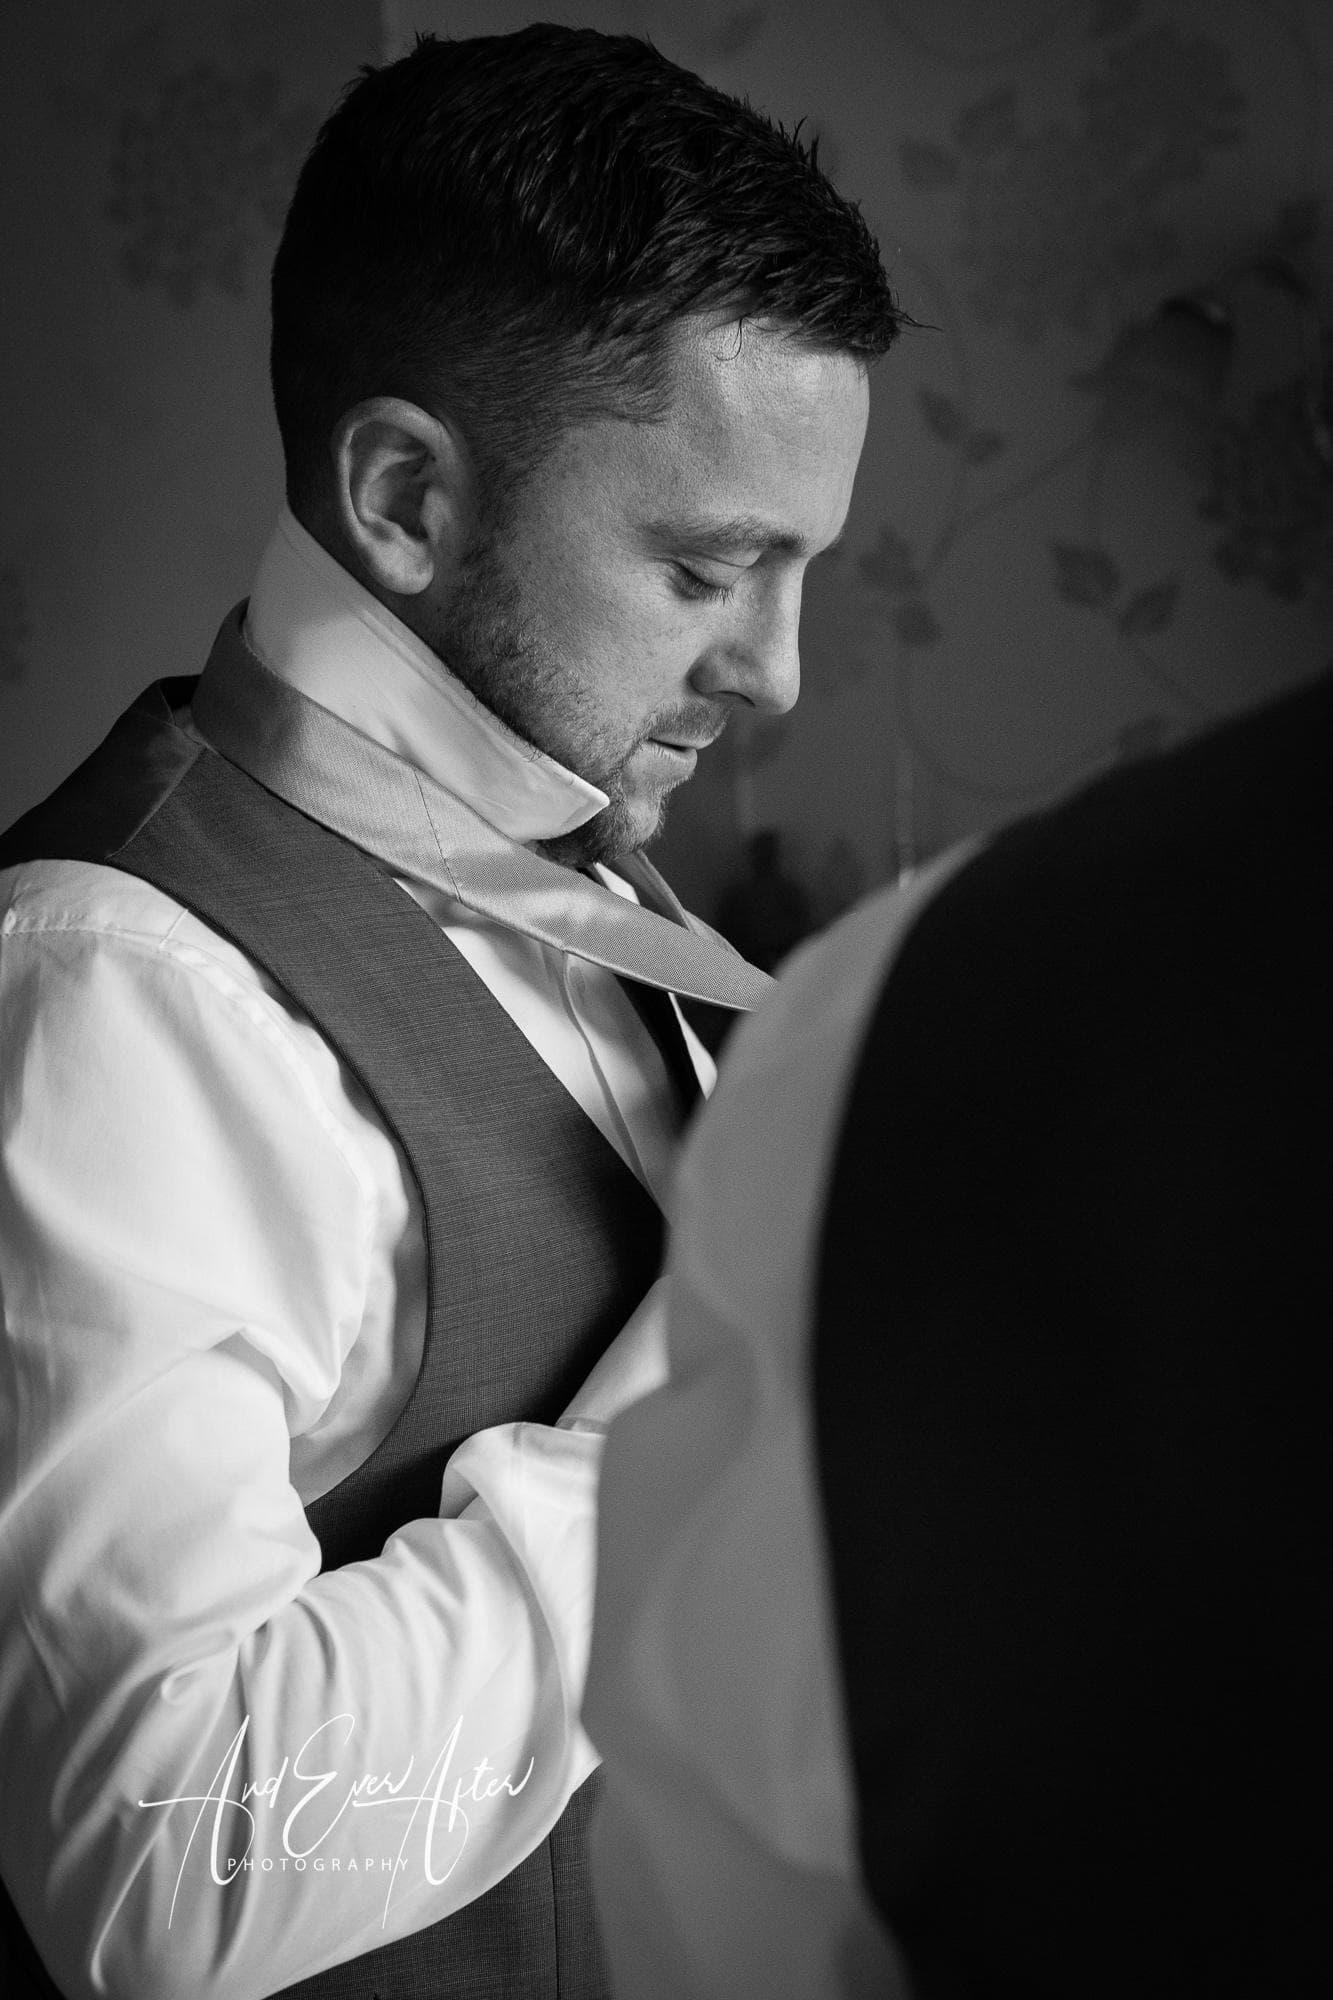 groom, wedding day preparations